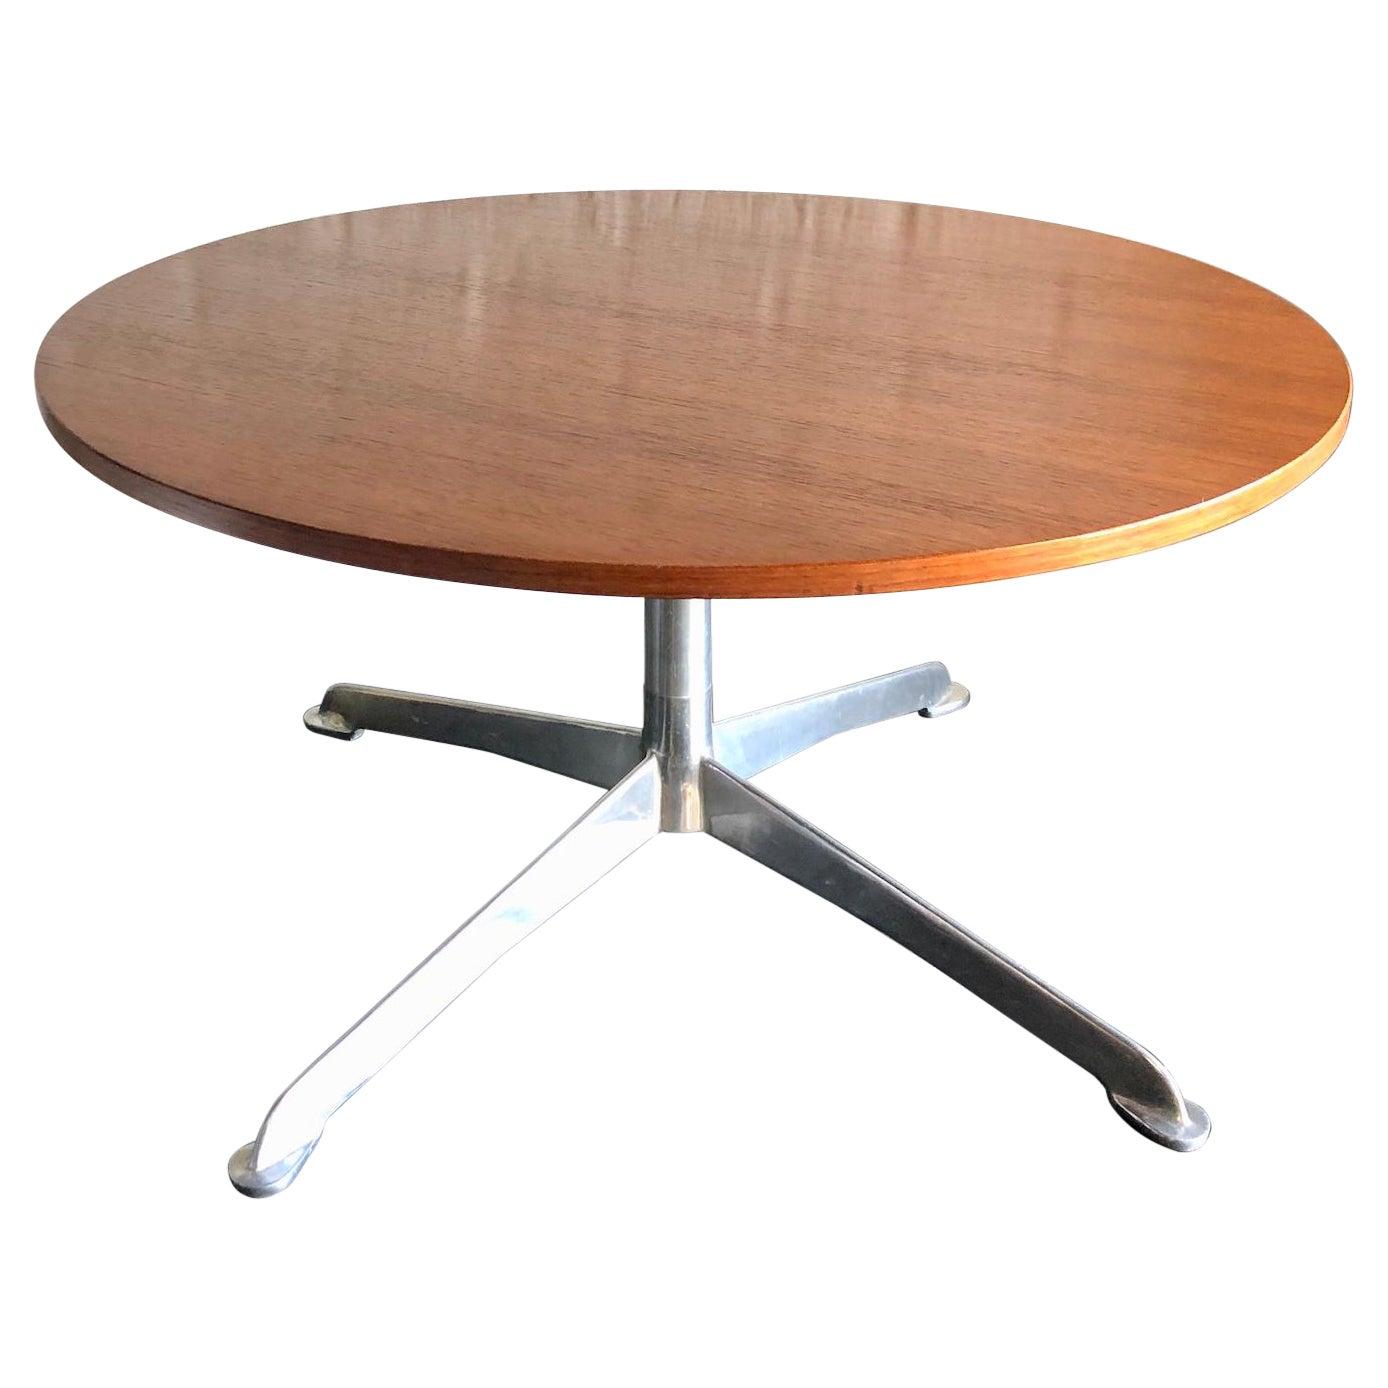 Mid-Century Modern Danish Round Teak Coffee / Occasional Table, Circa 1960s